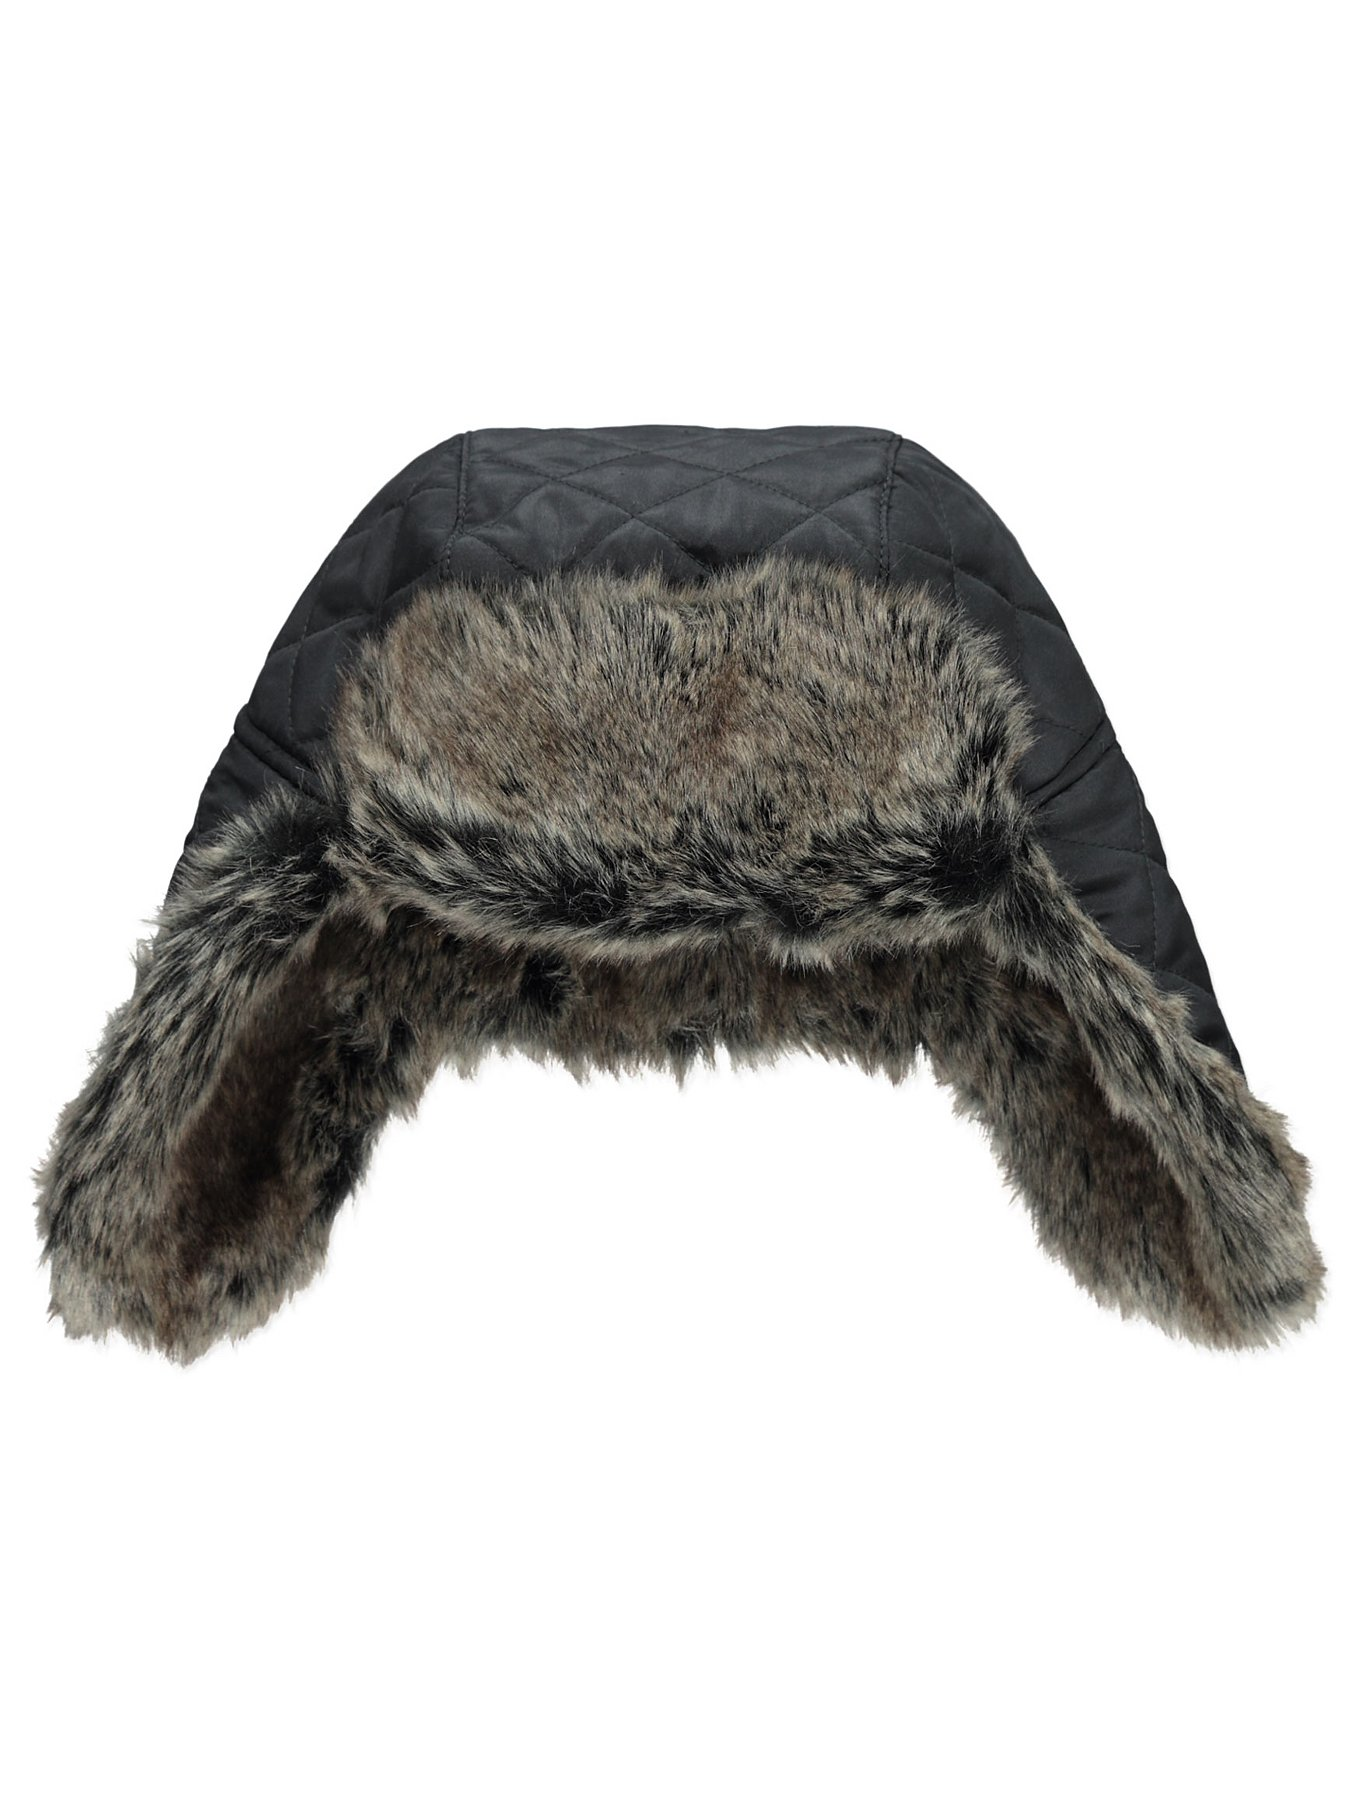 1eedecaacd0 Faux Fur Trim Trapper Hat